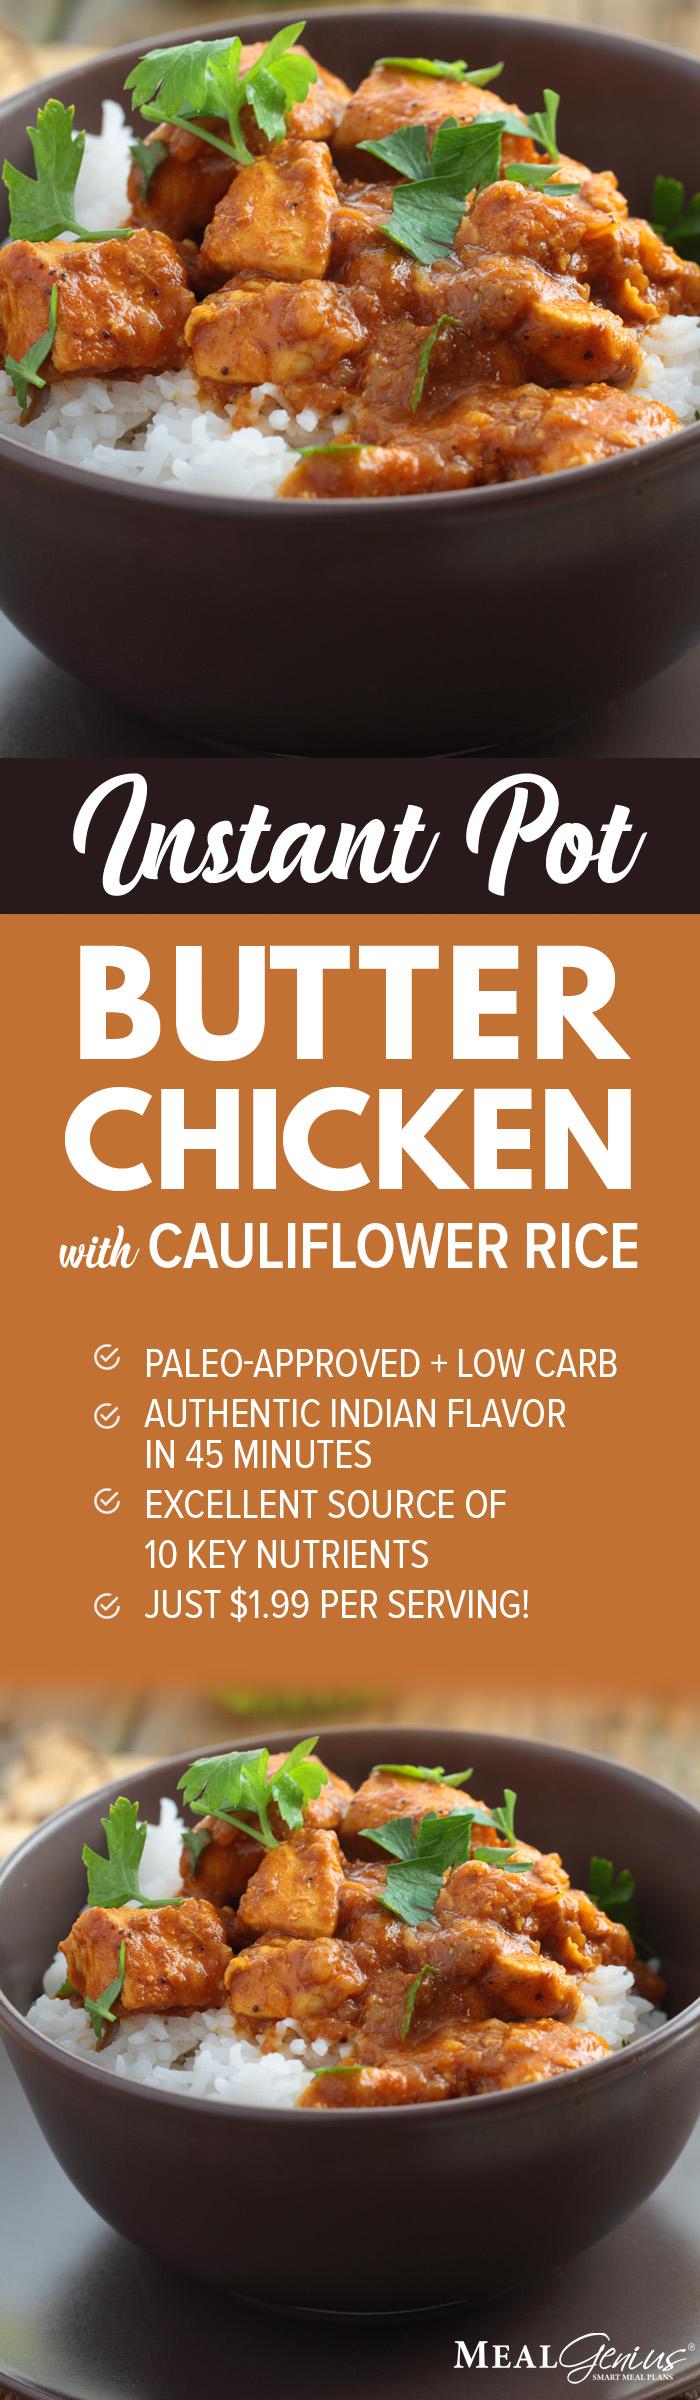 Instant Pot Butter Chicken with Cauliflower Rice - Meal Genius